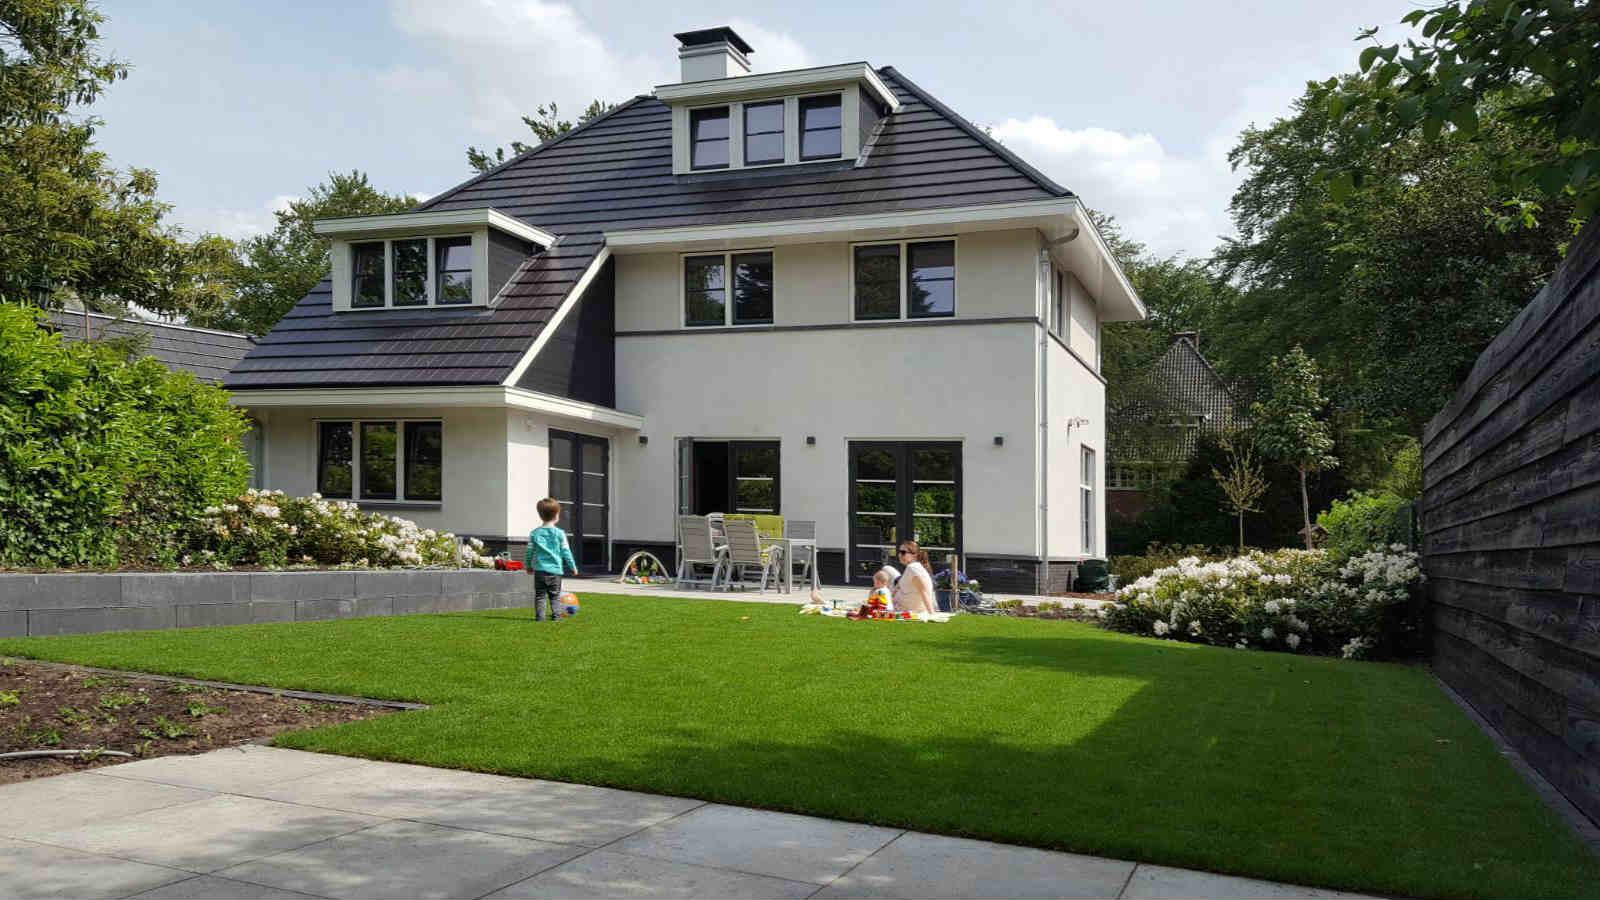 moderne woning strak wit gestuct stucwerk dakpan dakkapel architectenbureau architect